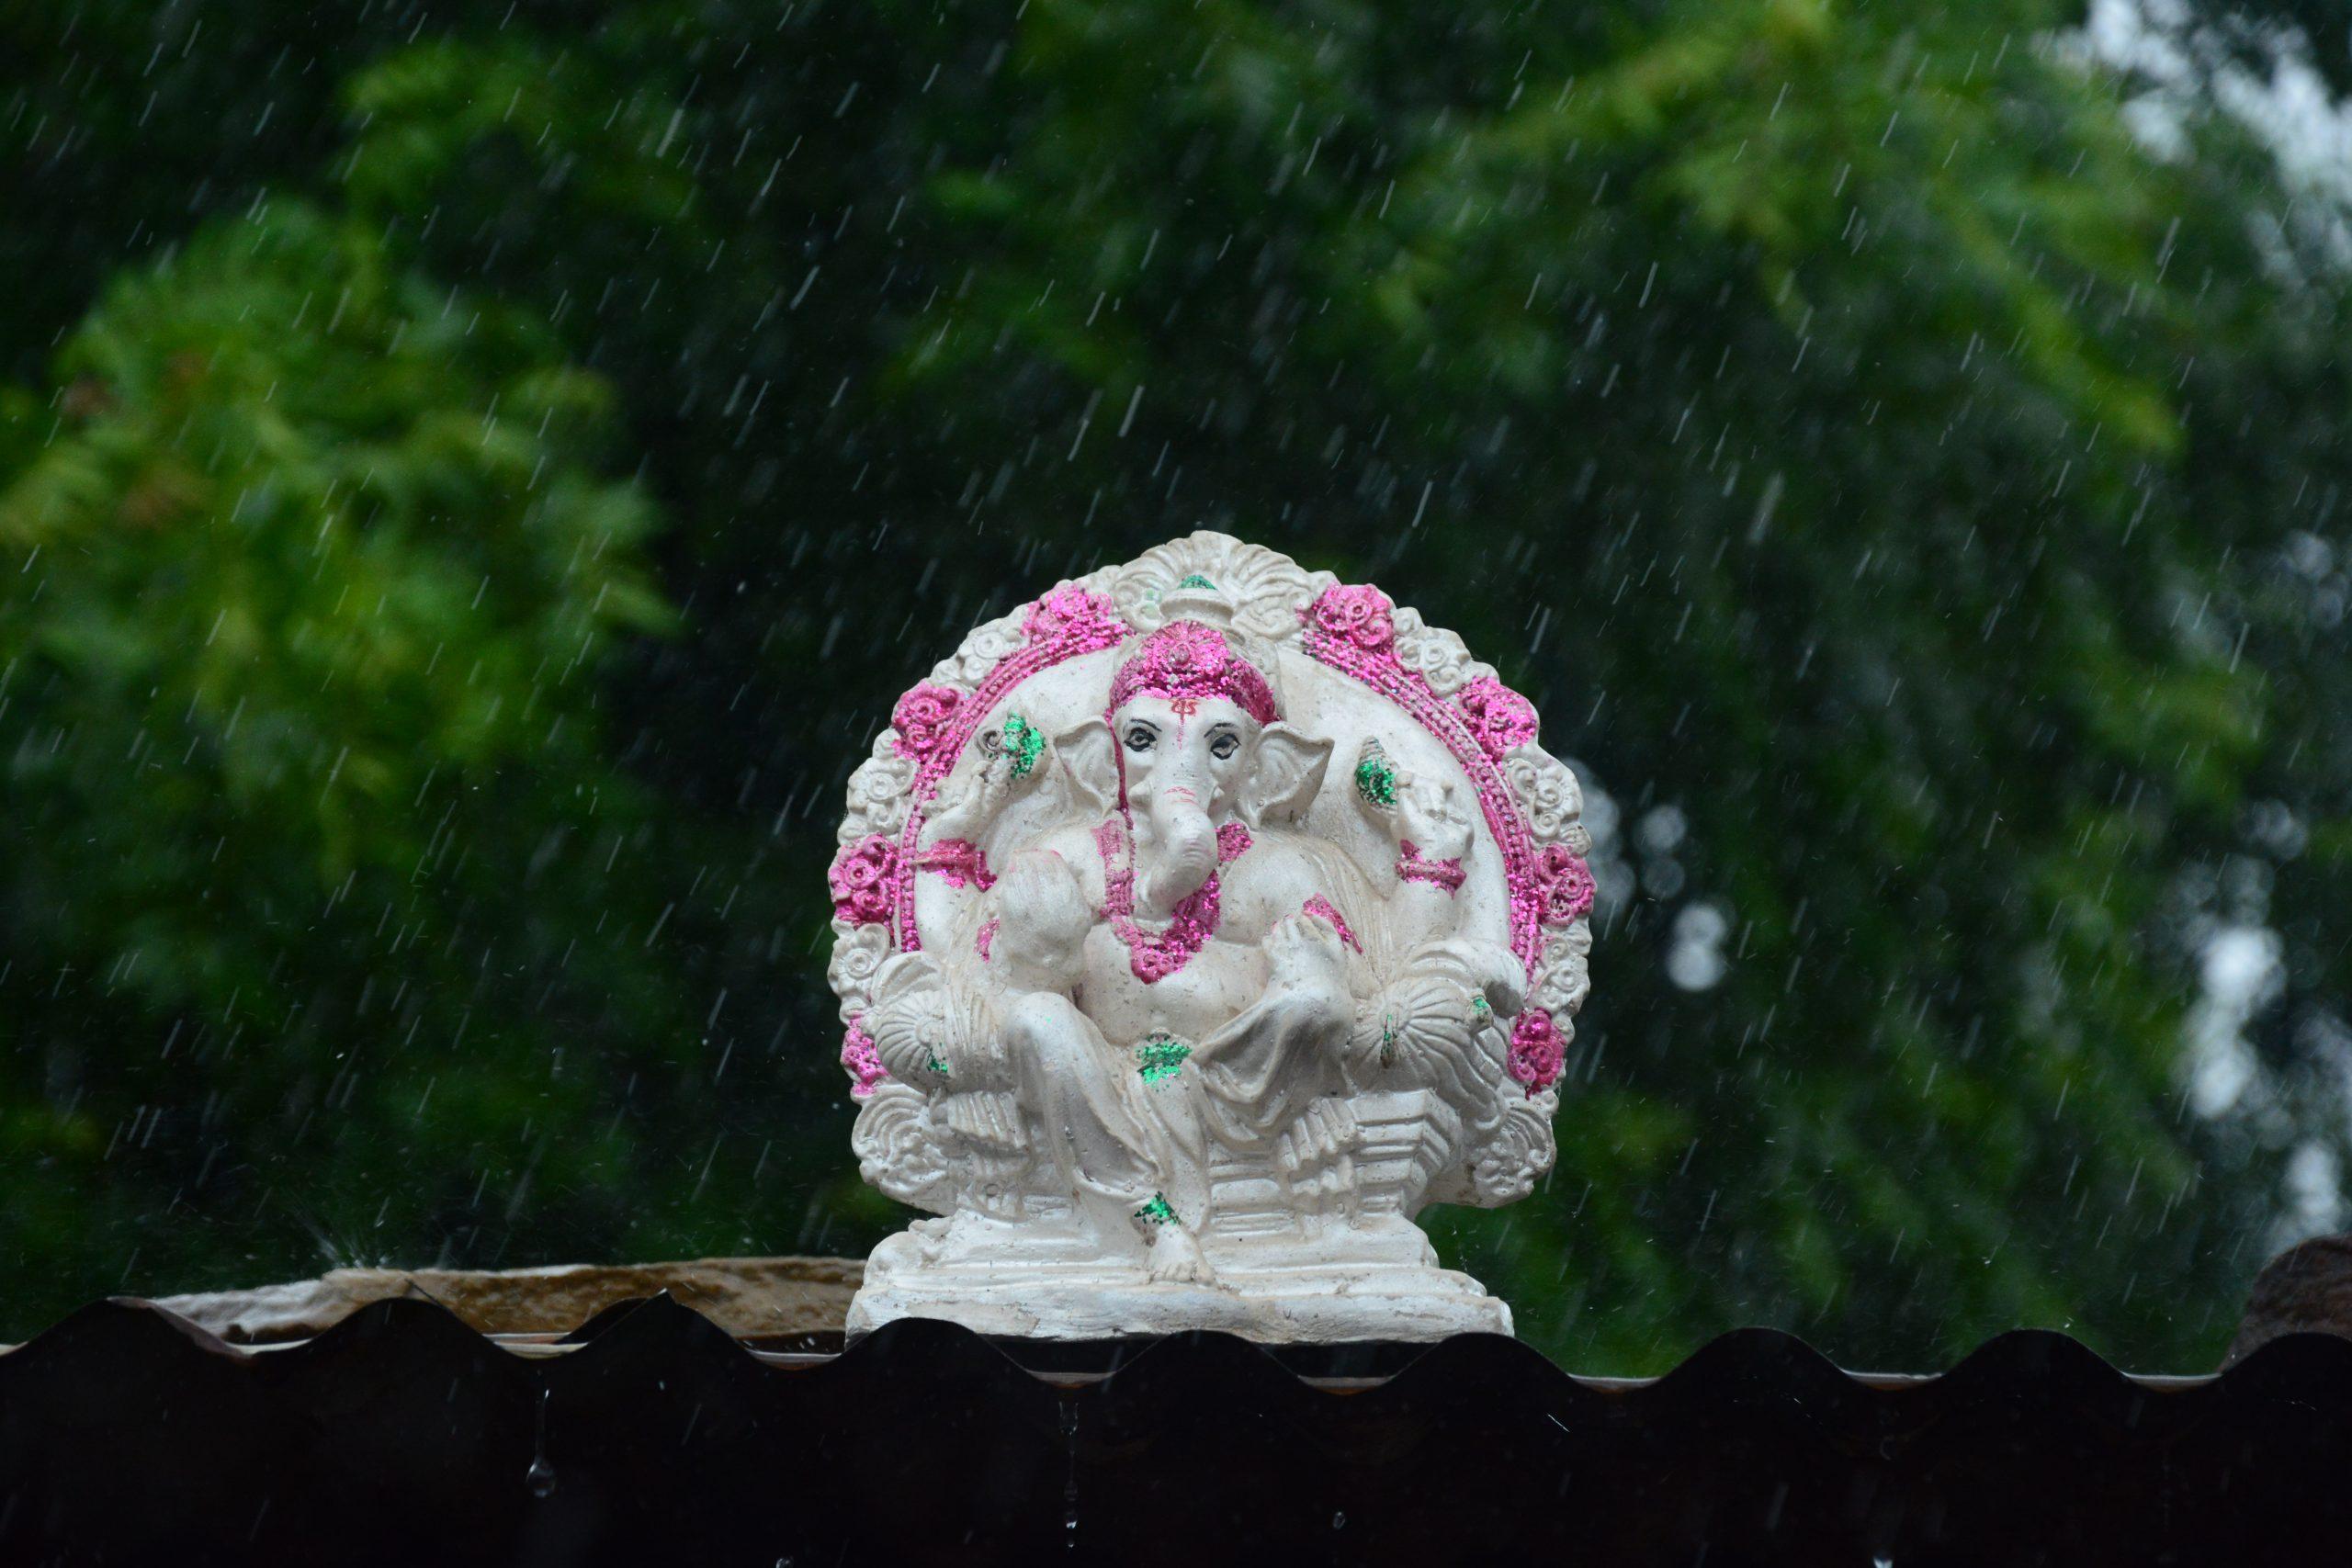 Shree Ganesha in rain